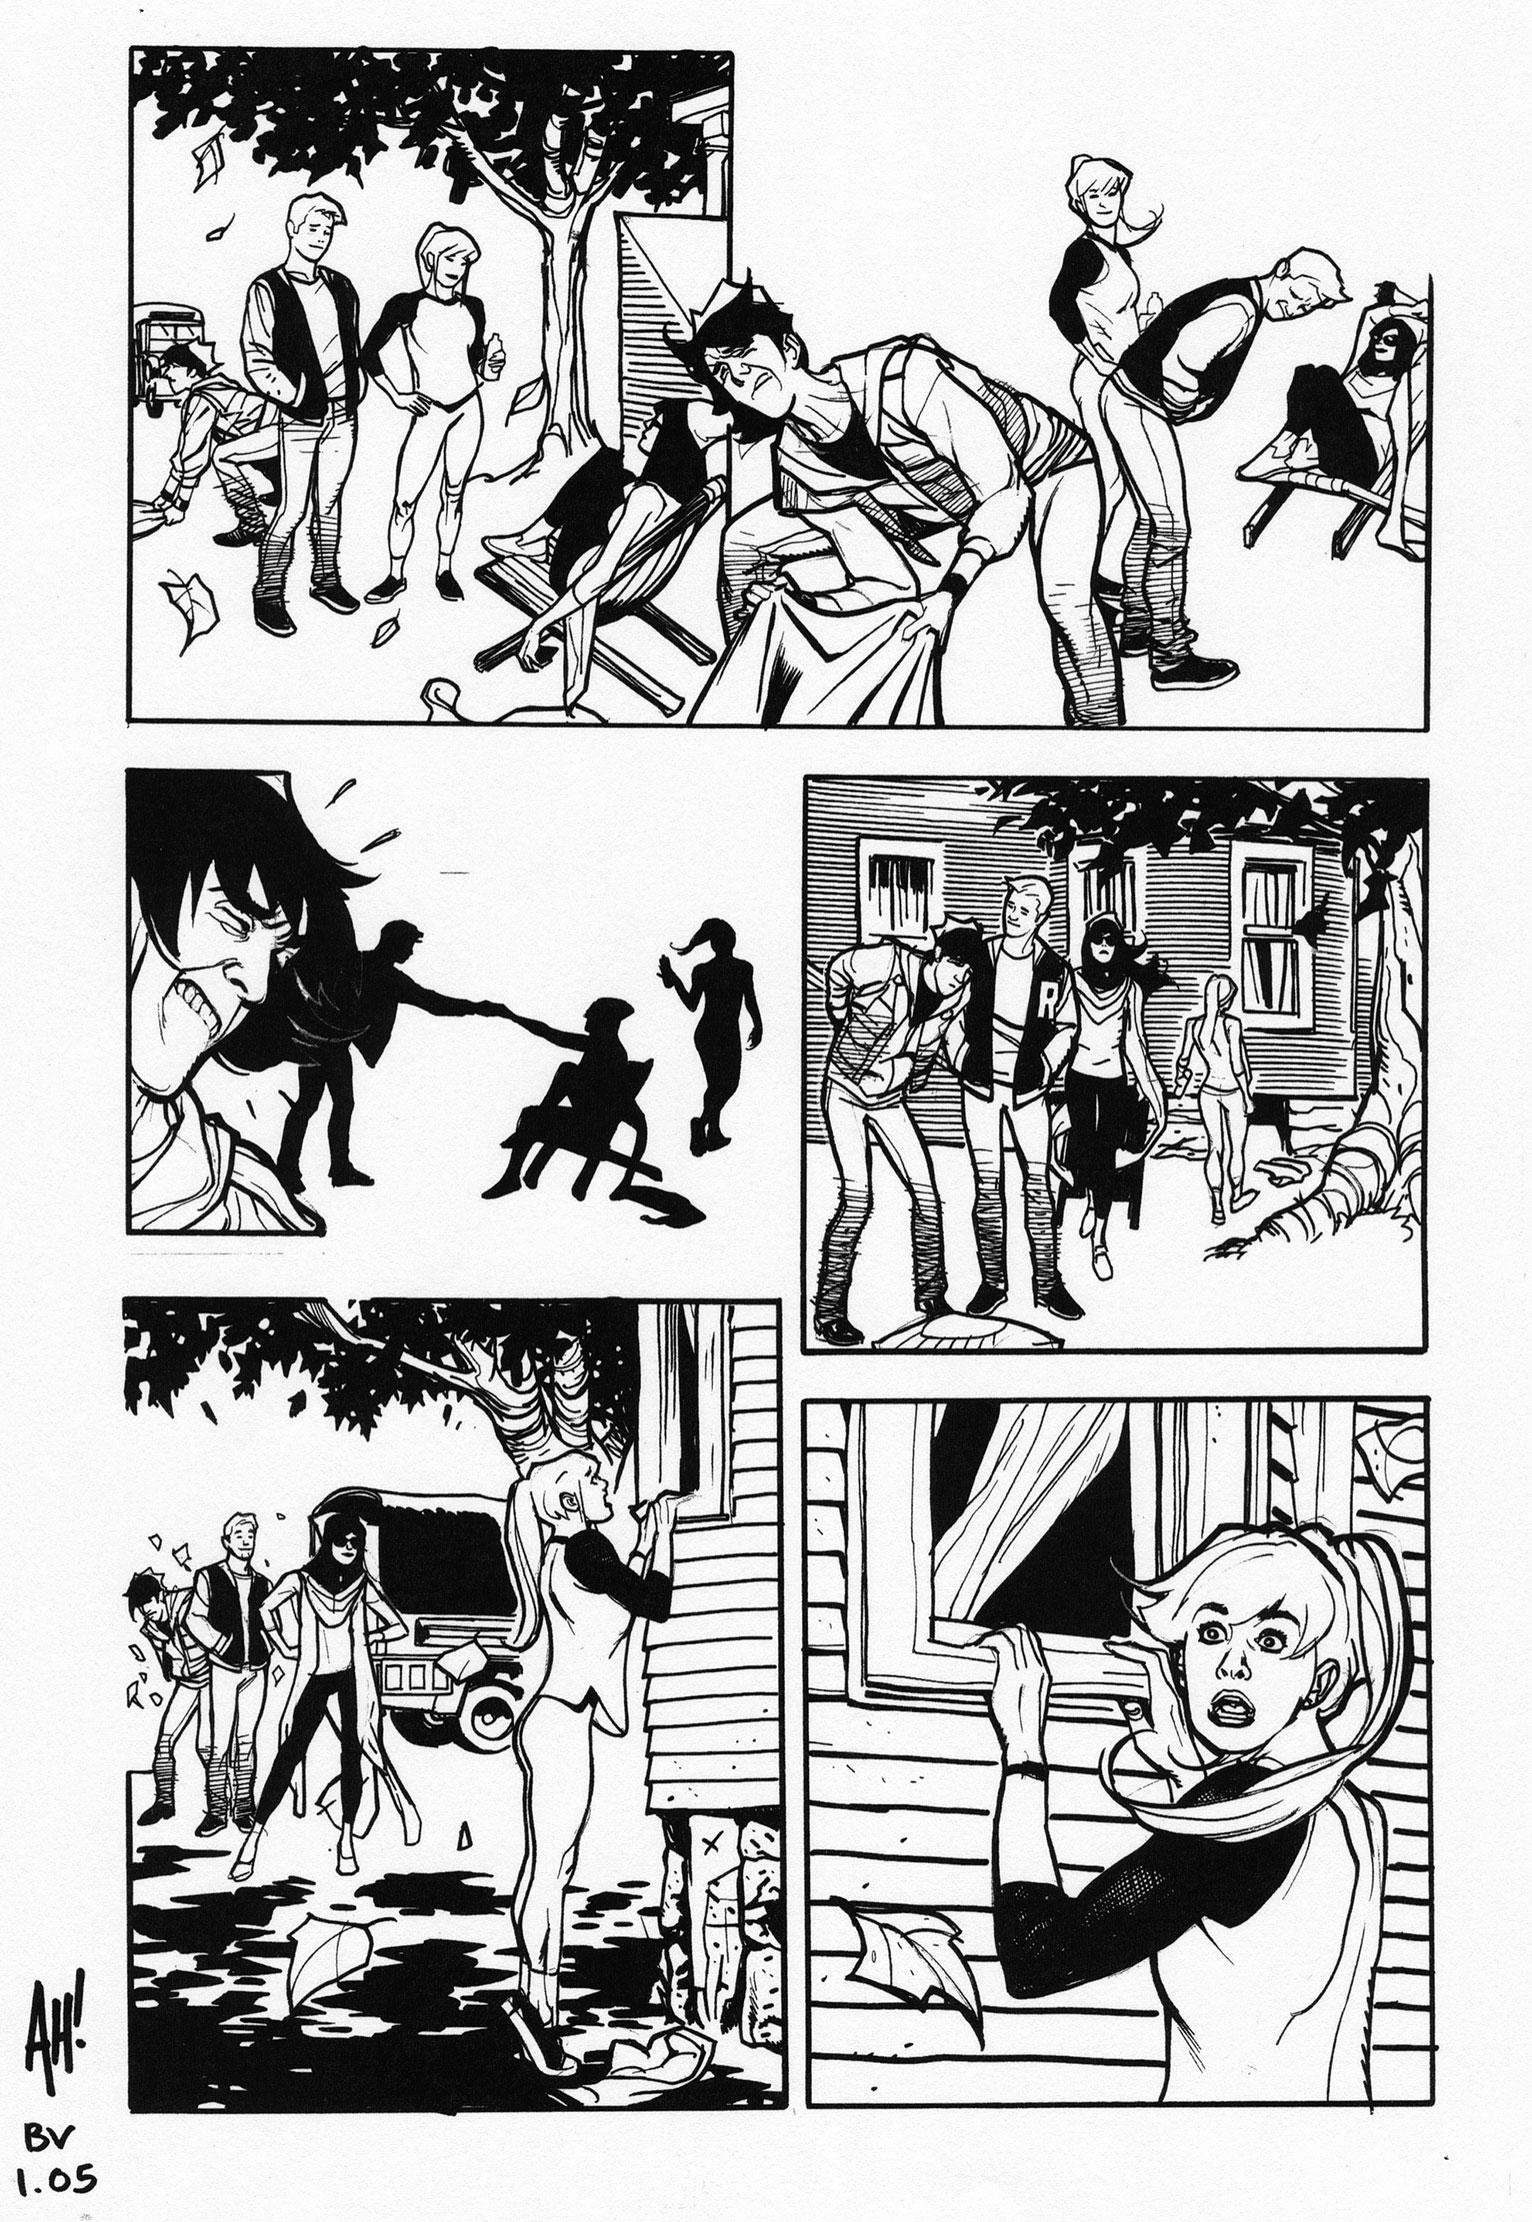 ADAM HUGHES 2016 BETTY & VERONICA #1 Comic Art